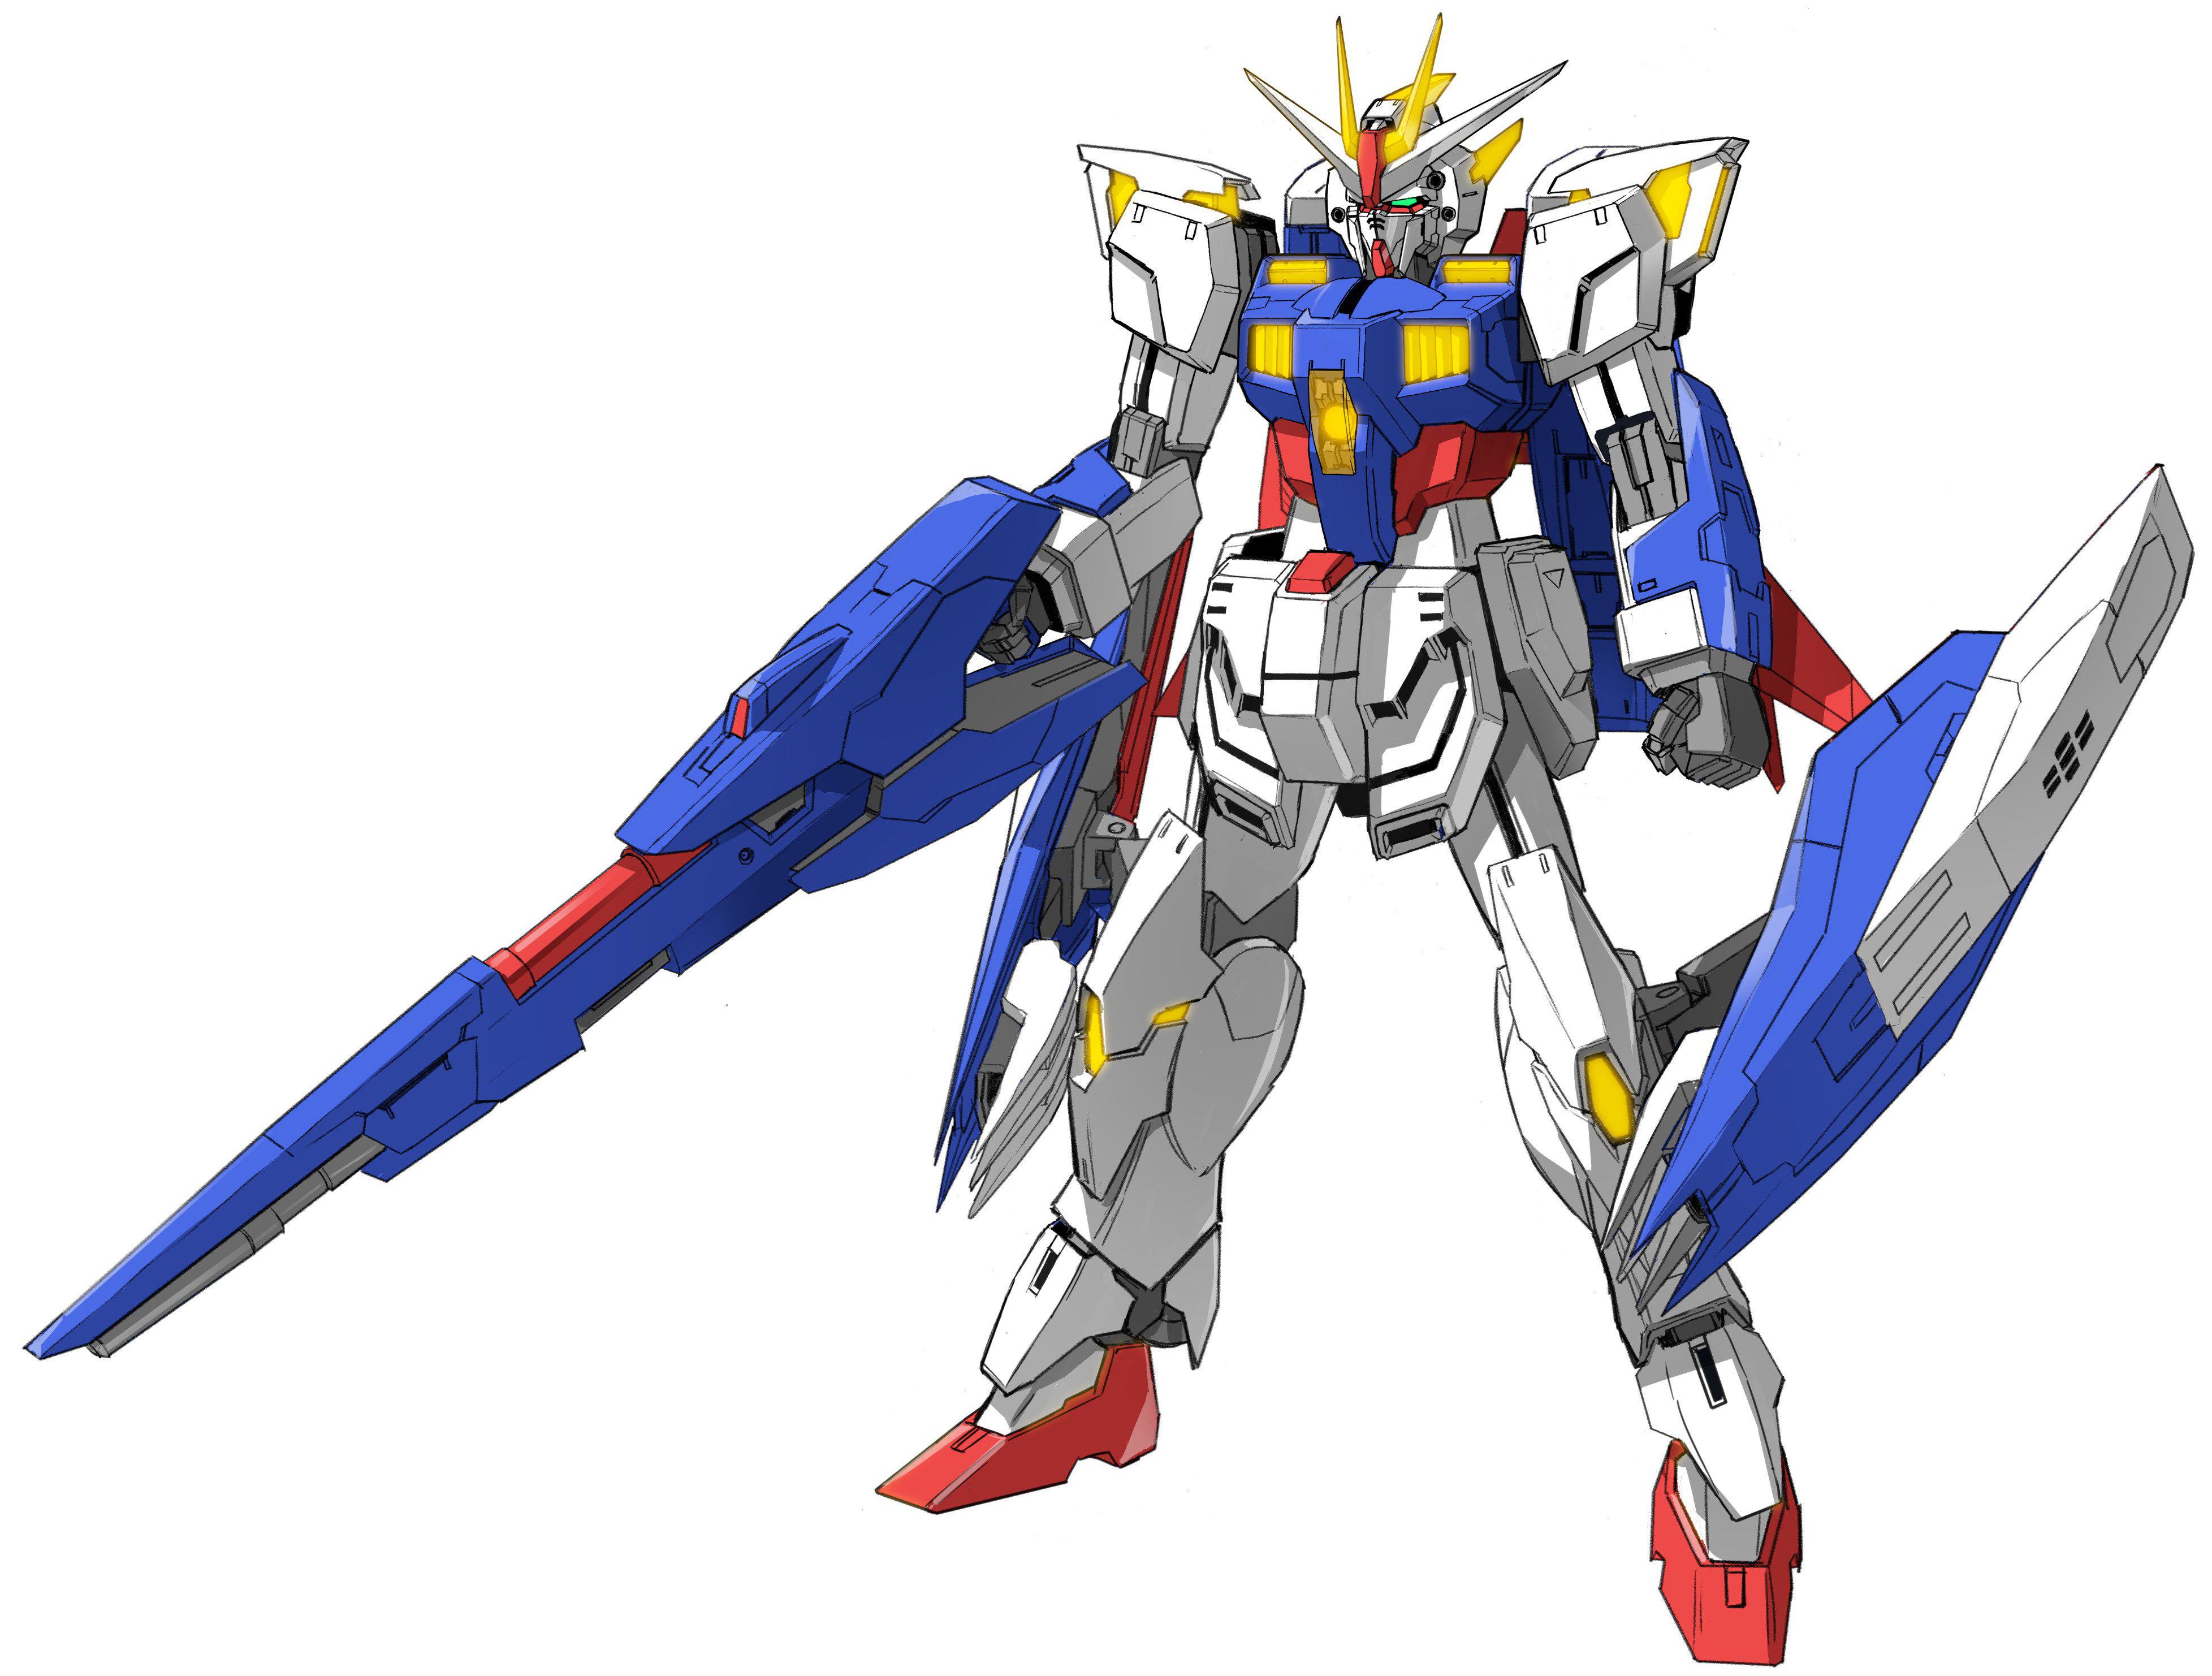 12+ Shining Hand Gundam Image Download 7